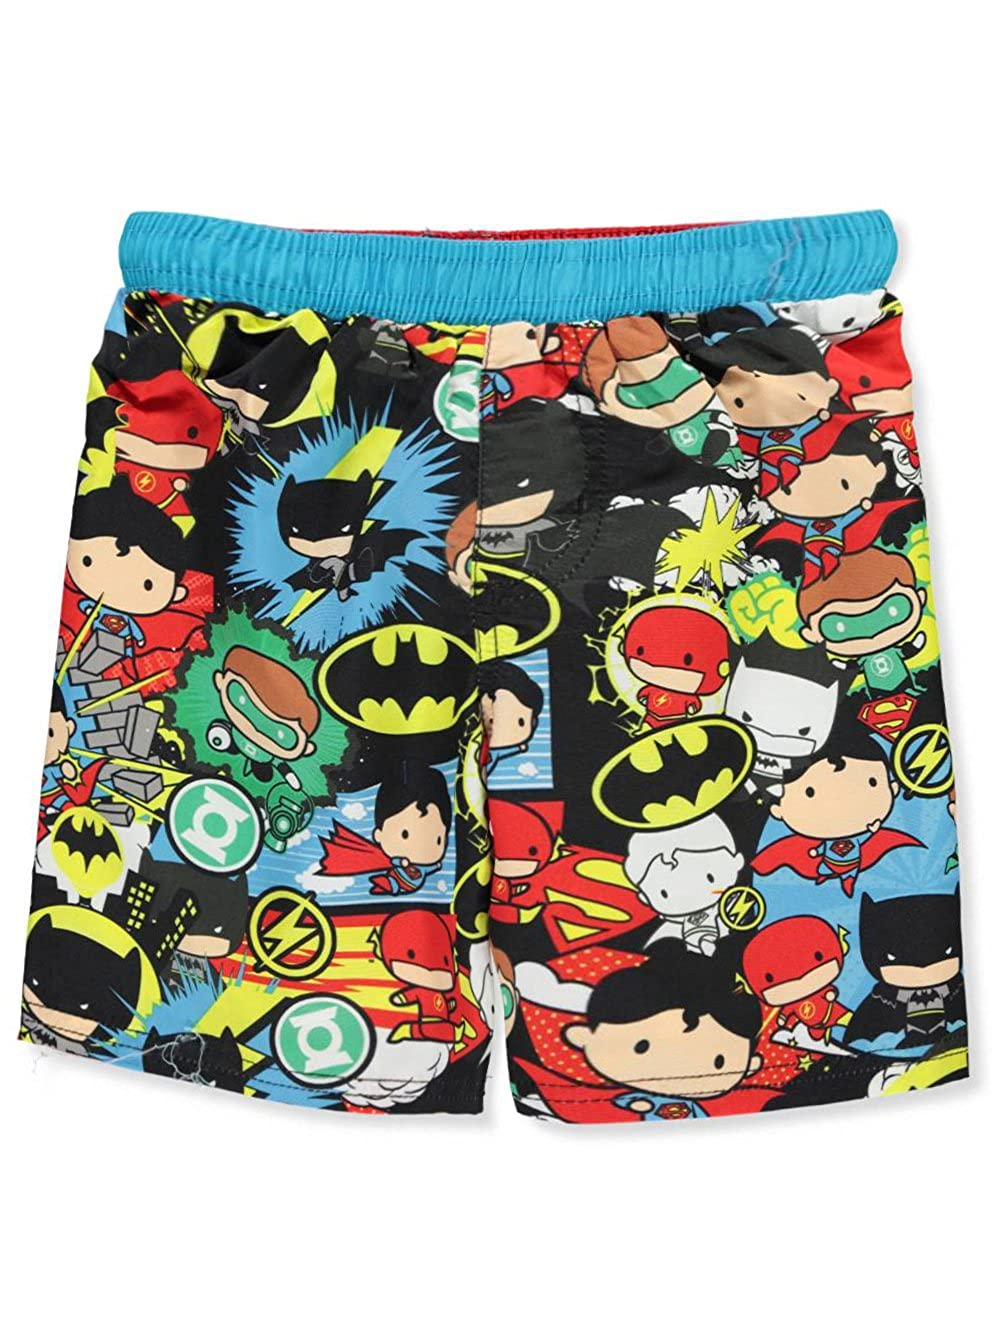 Justice League Boys' Boardshorts